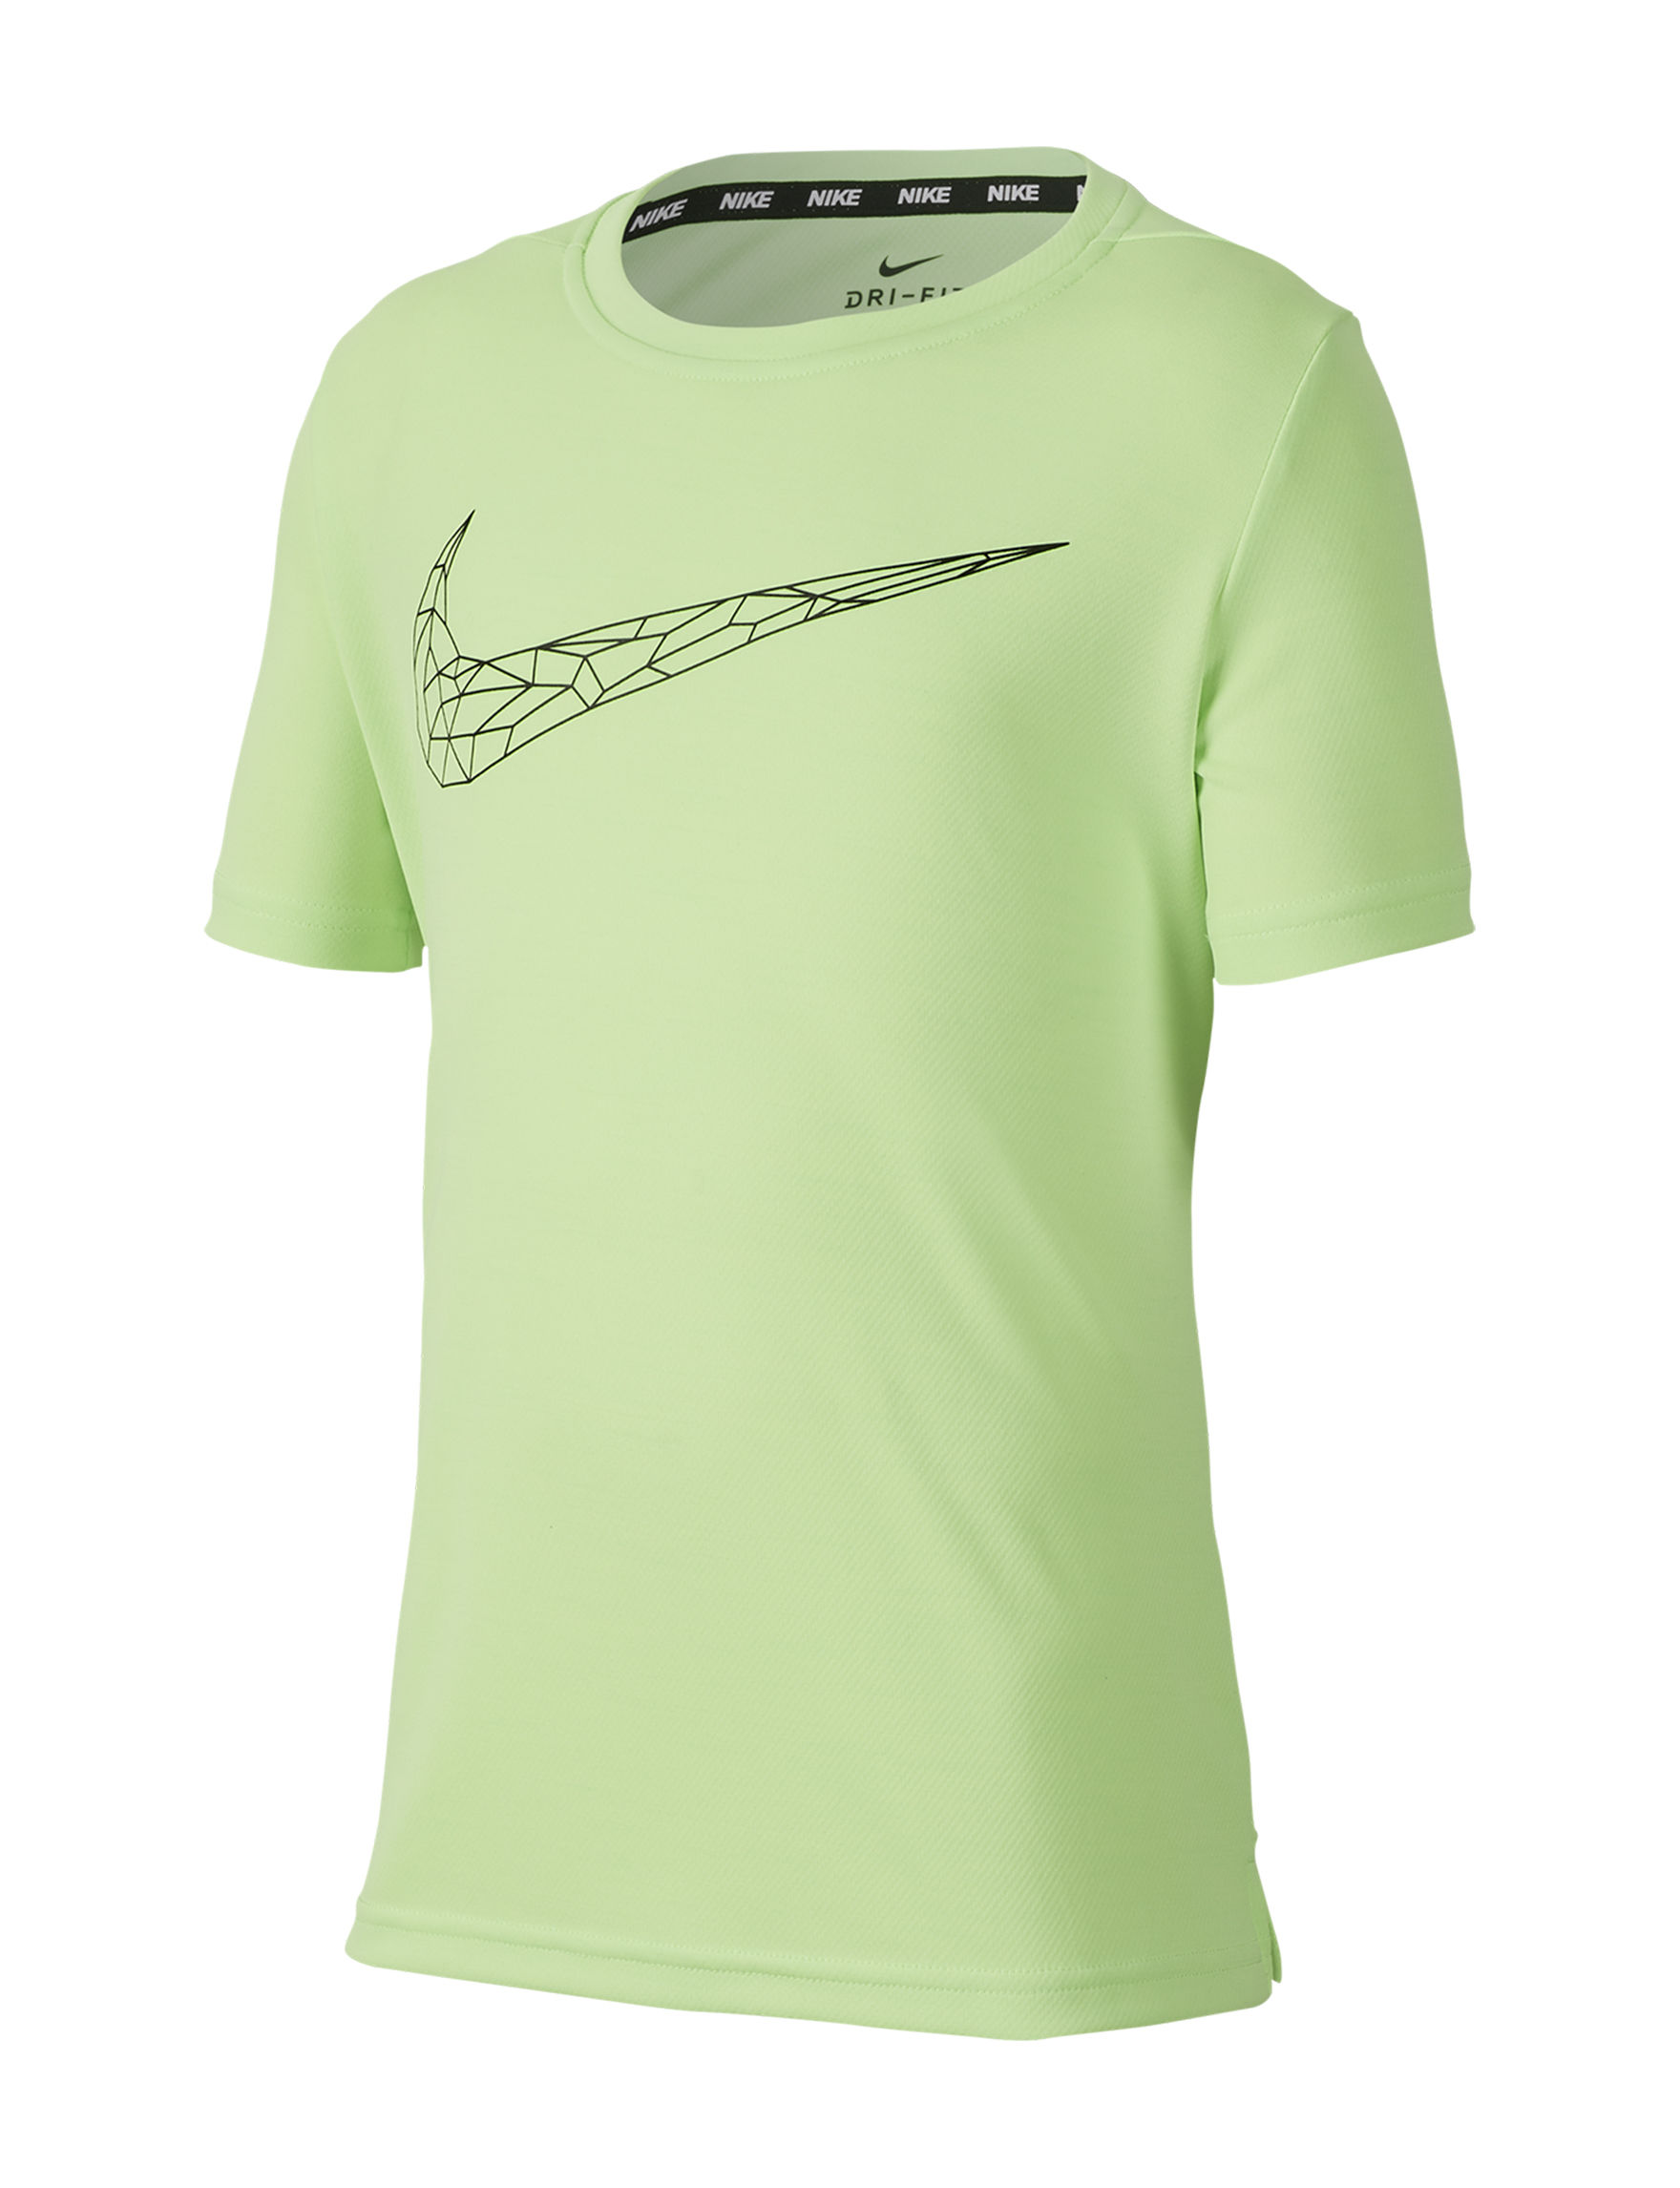 c8c7460a Nike Dri-FIT Breathe Swoosh Graphic Training T-shirt - Boys 8-20 ...